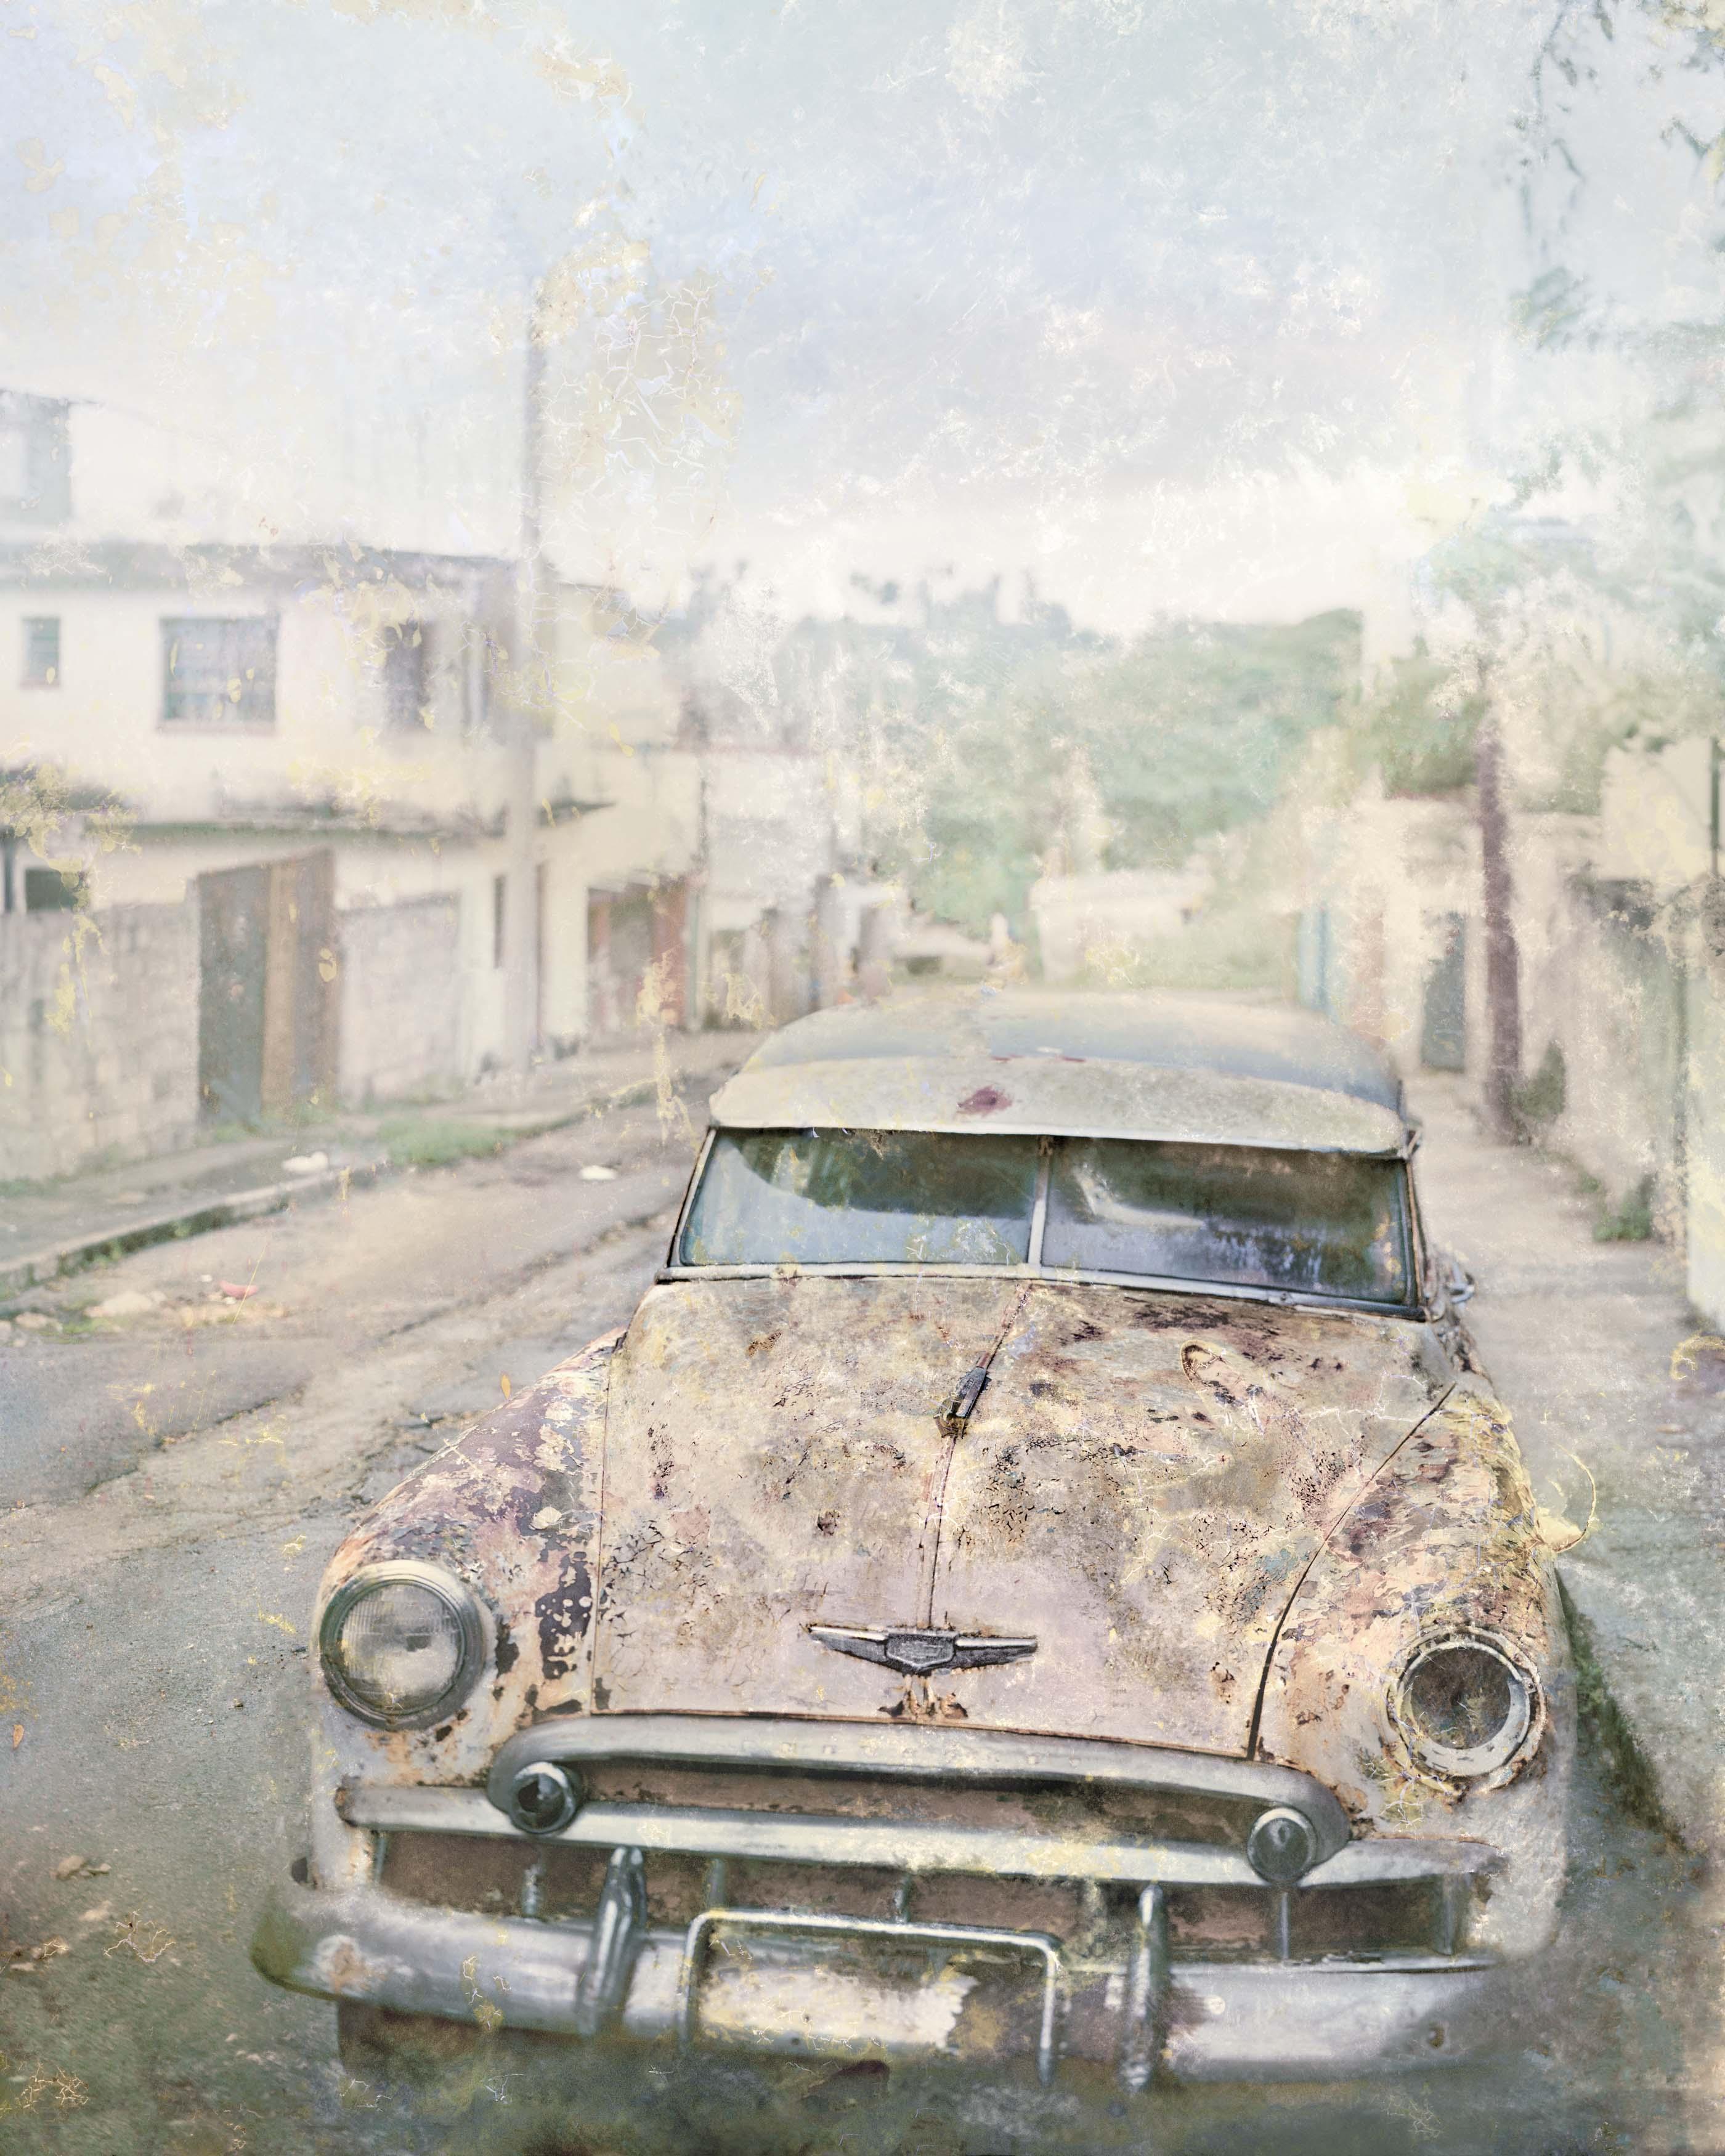 La Habana Centro, 2016<br/>Impresión de tintas de pigmentos sobre papel  hahnemühle, montada sobre dibond de aluminio / Inkjet print on hannemühle paper mounted on aluminum dibond